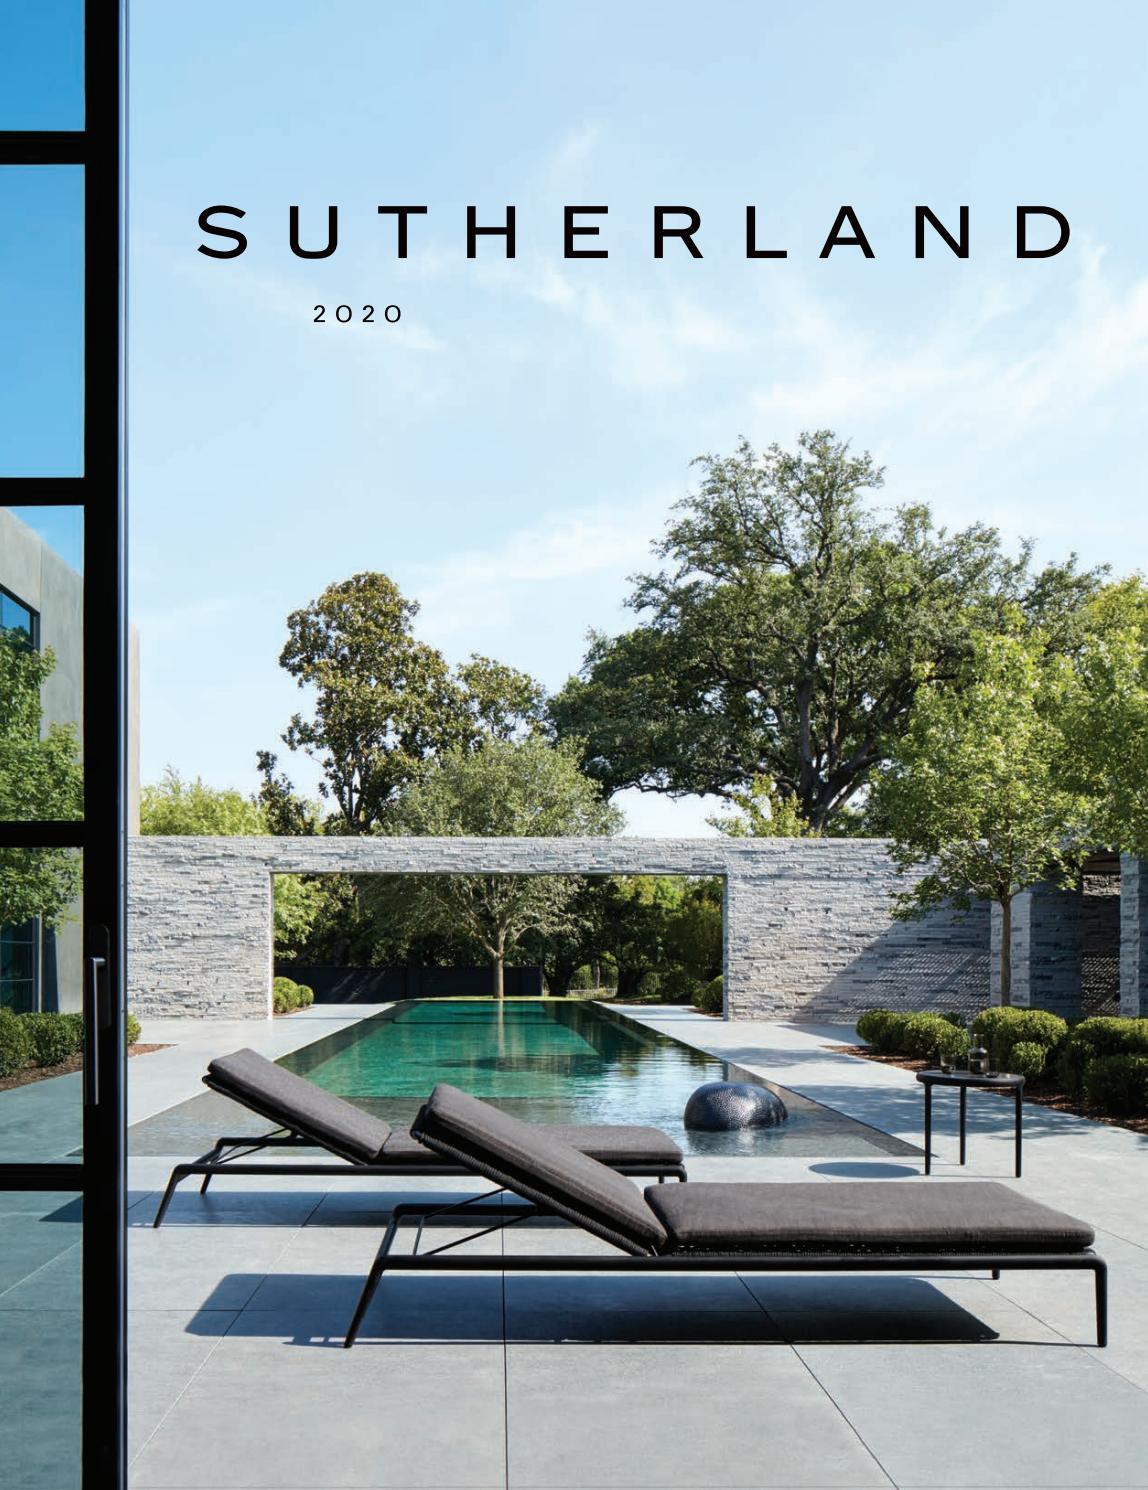 Sutherland 2020 Catalog by Sutherland - issuu